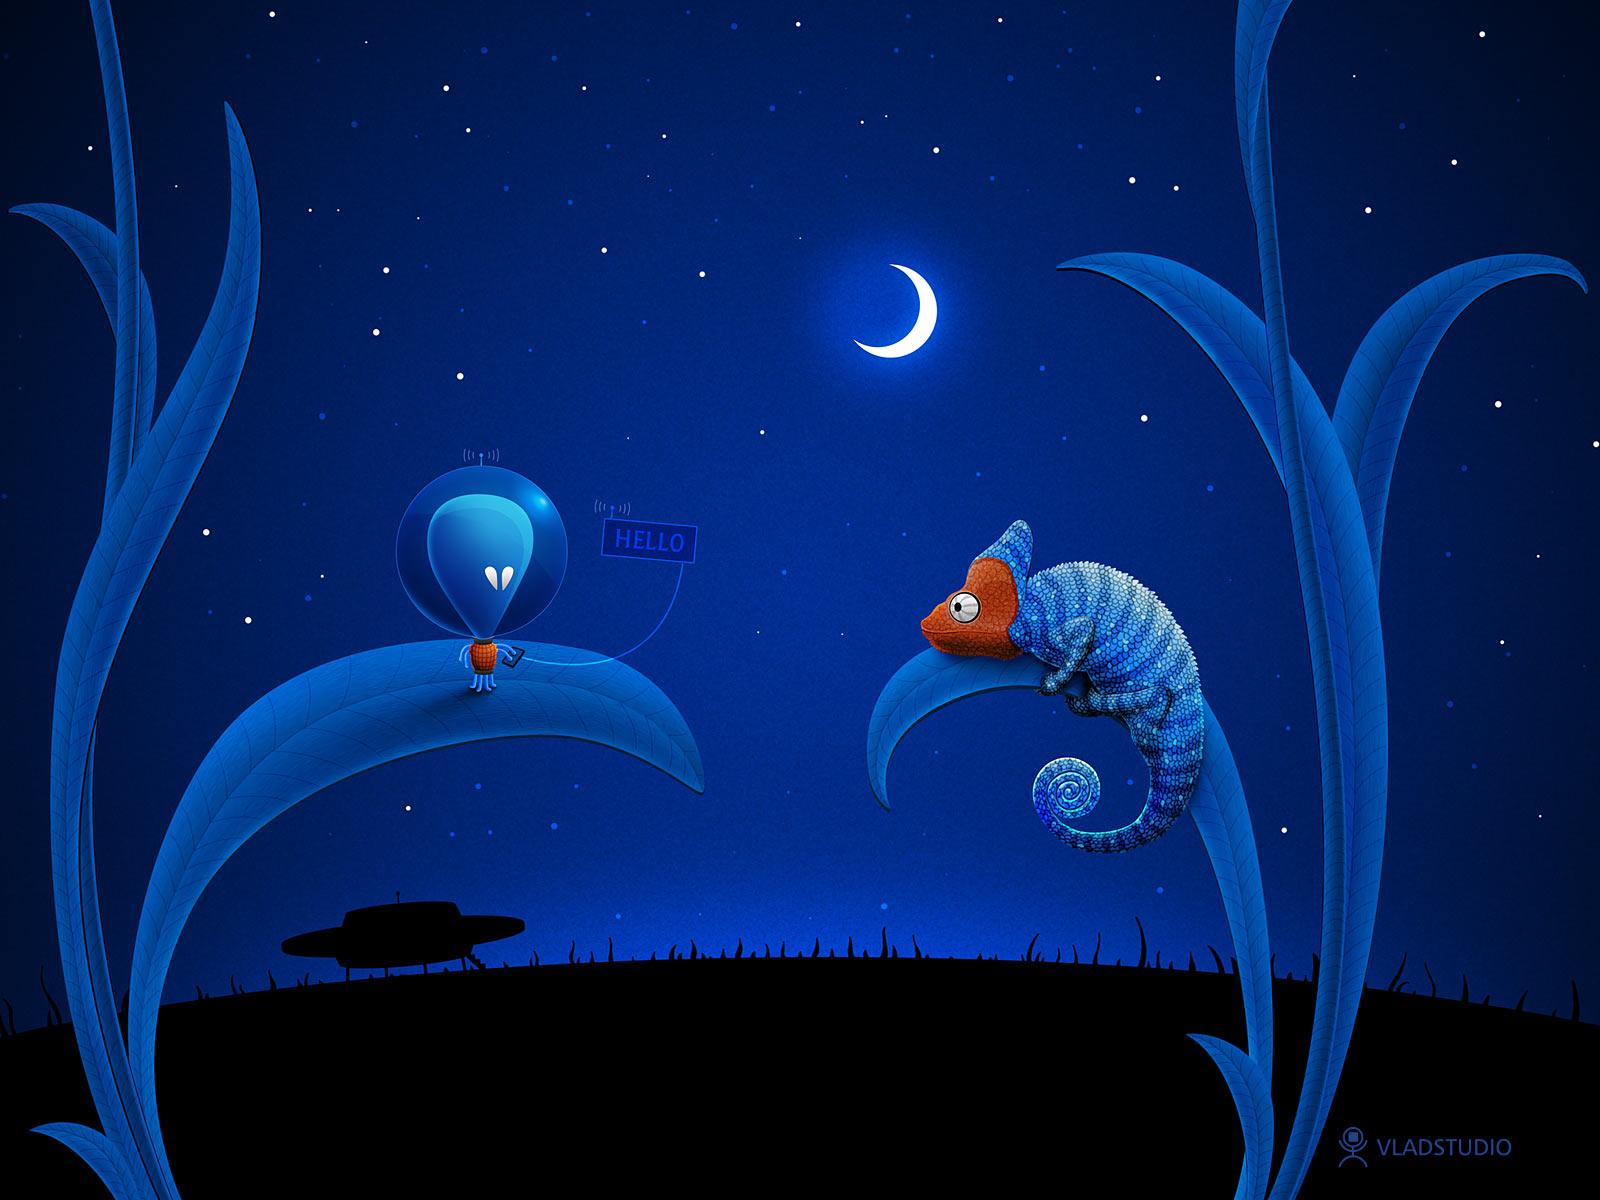 Alien and Chameleon by vladstudio